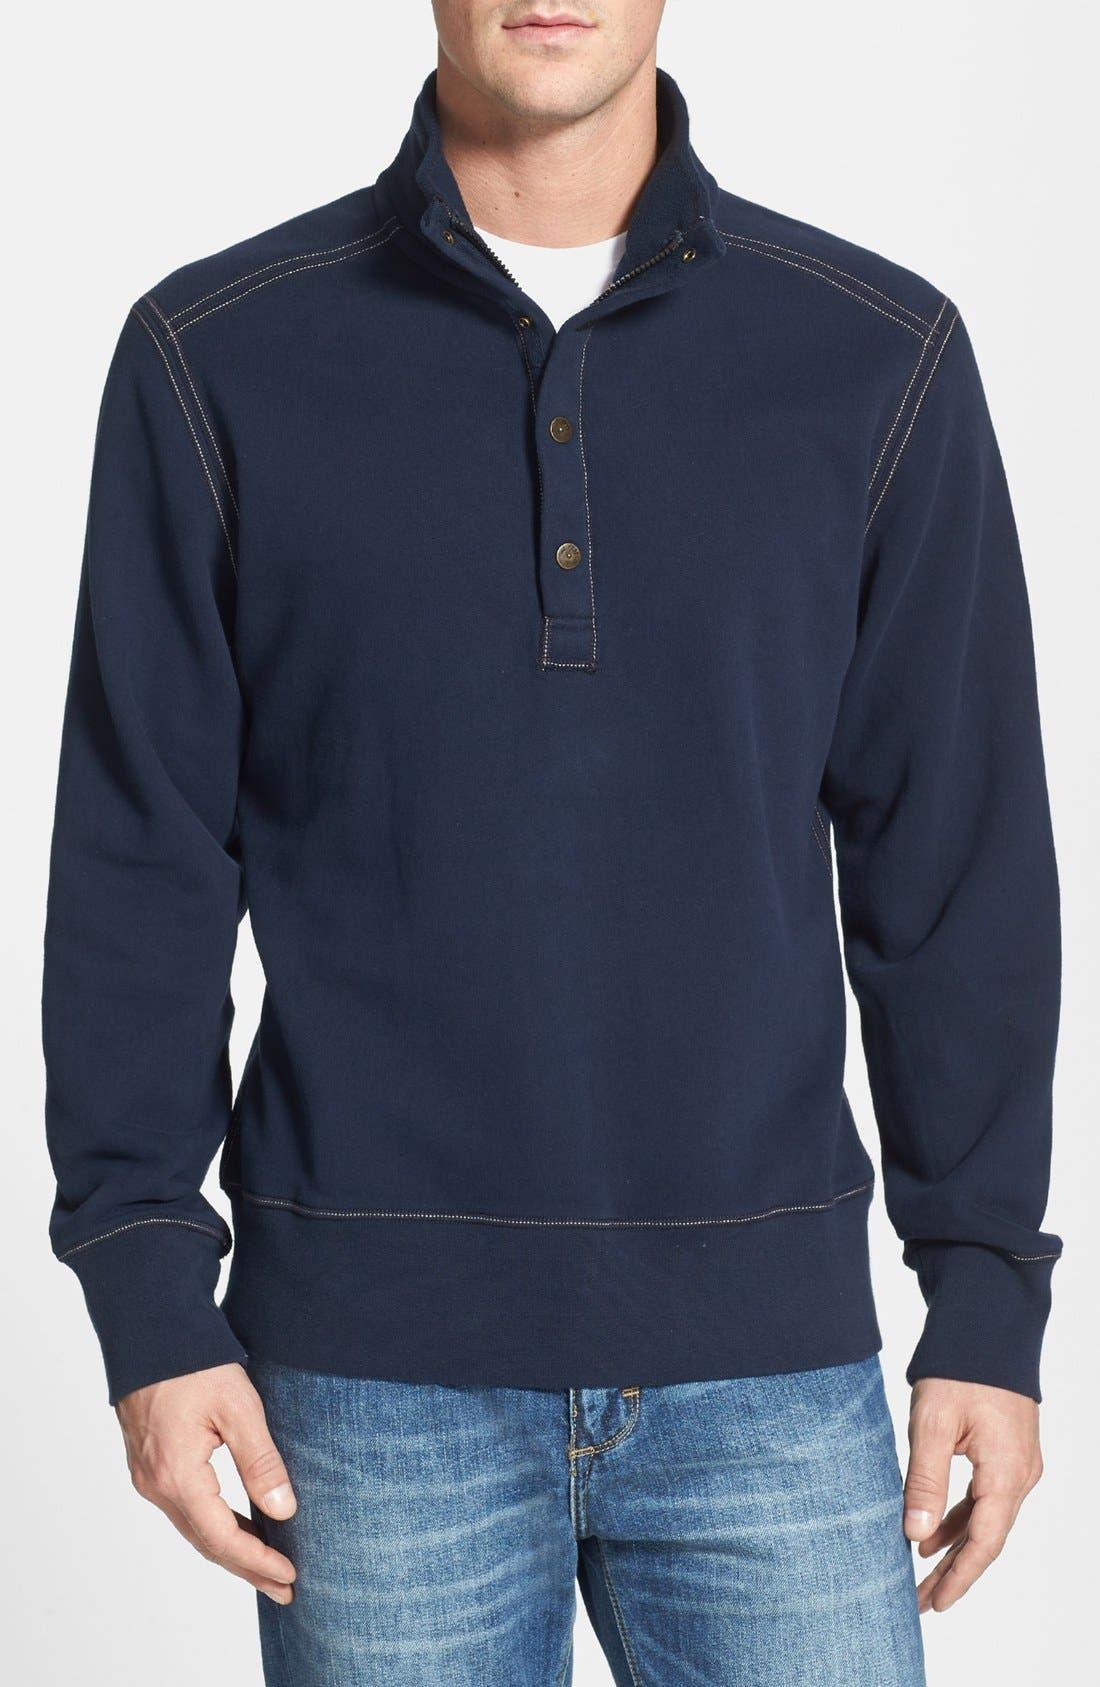 Main Image - Tommy Bahama Denim 'Explorer' Half Zip Sweatshirt